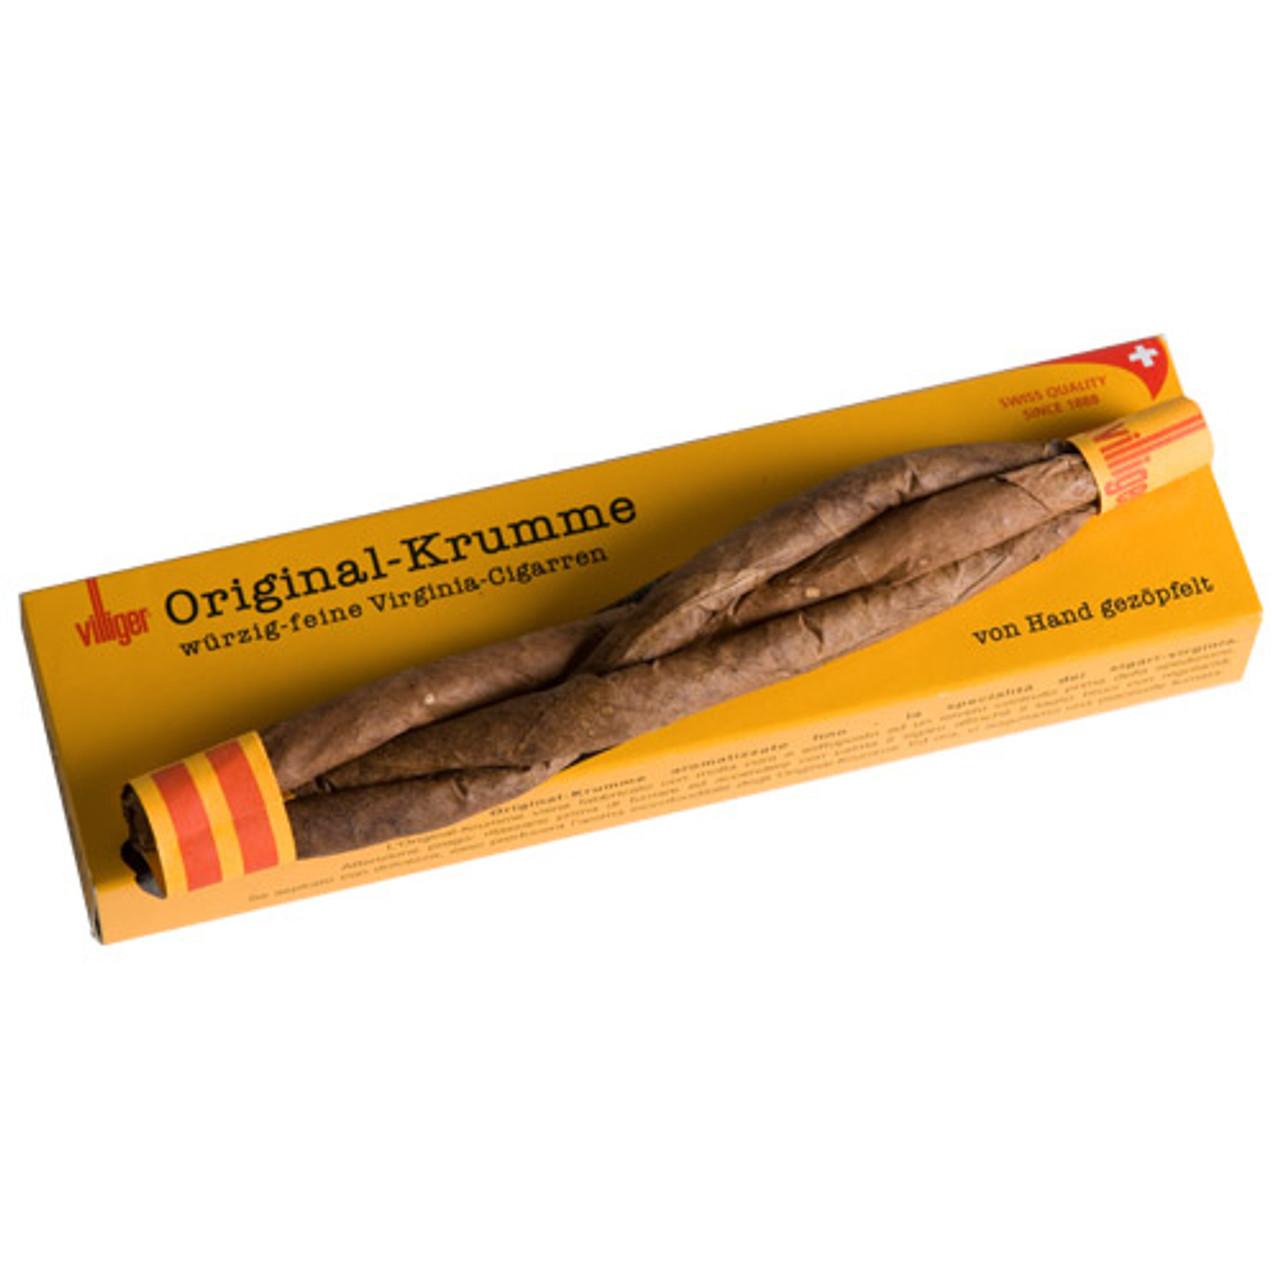 Villiger Original Krumme Cigars - 7.25 x 24 (Box of 24)